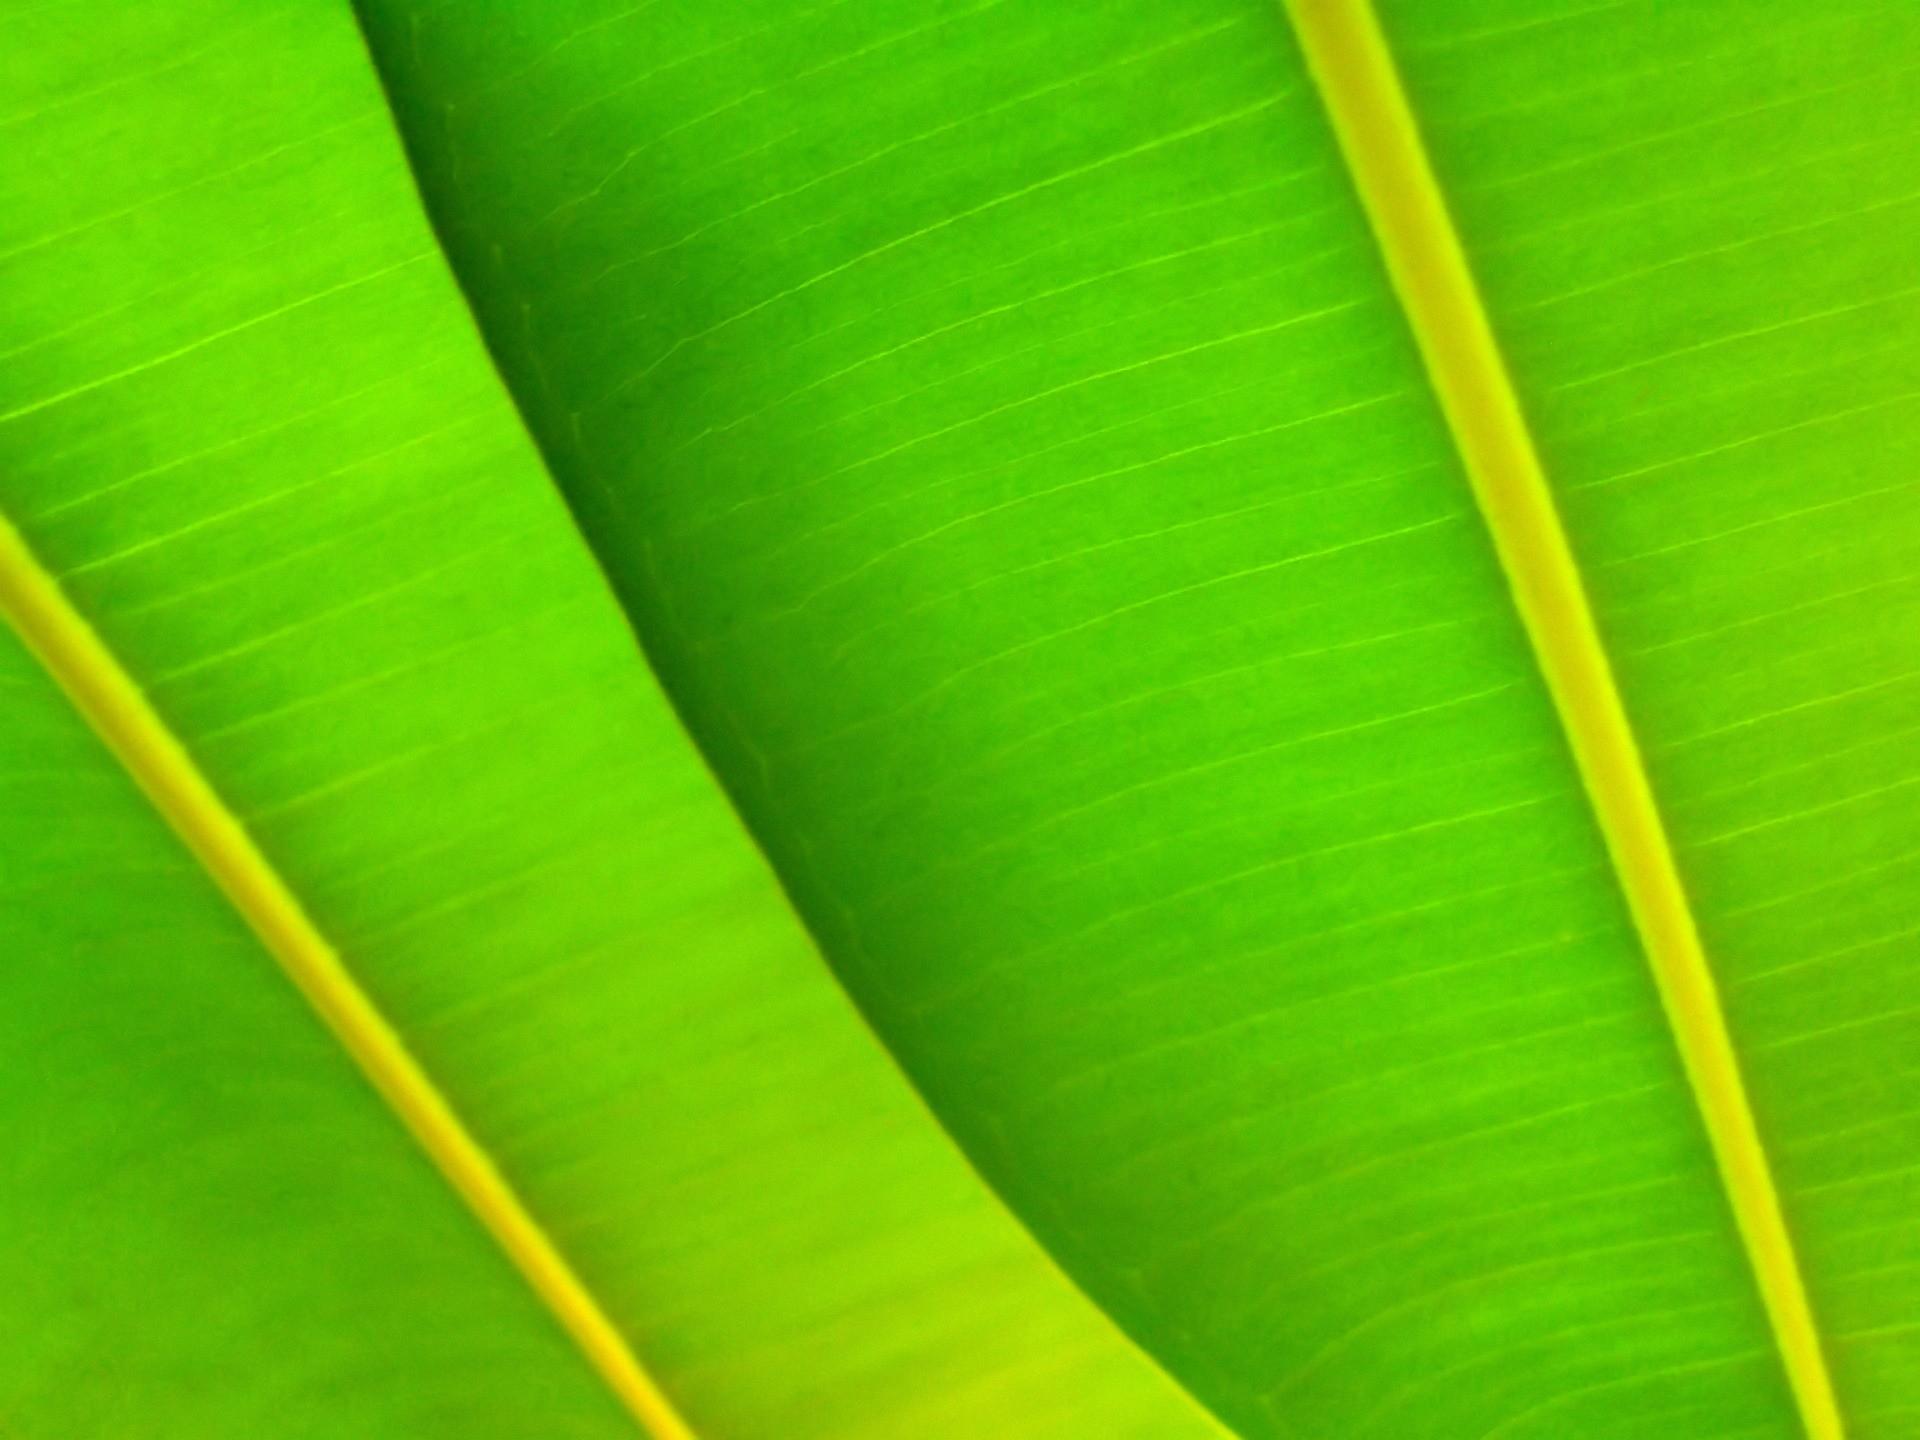 Green leafs Wallpaper Plants Nature